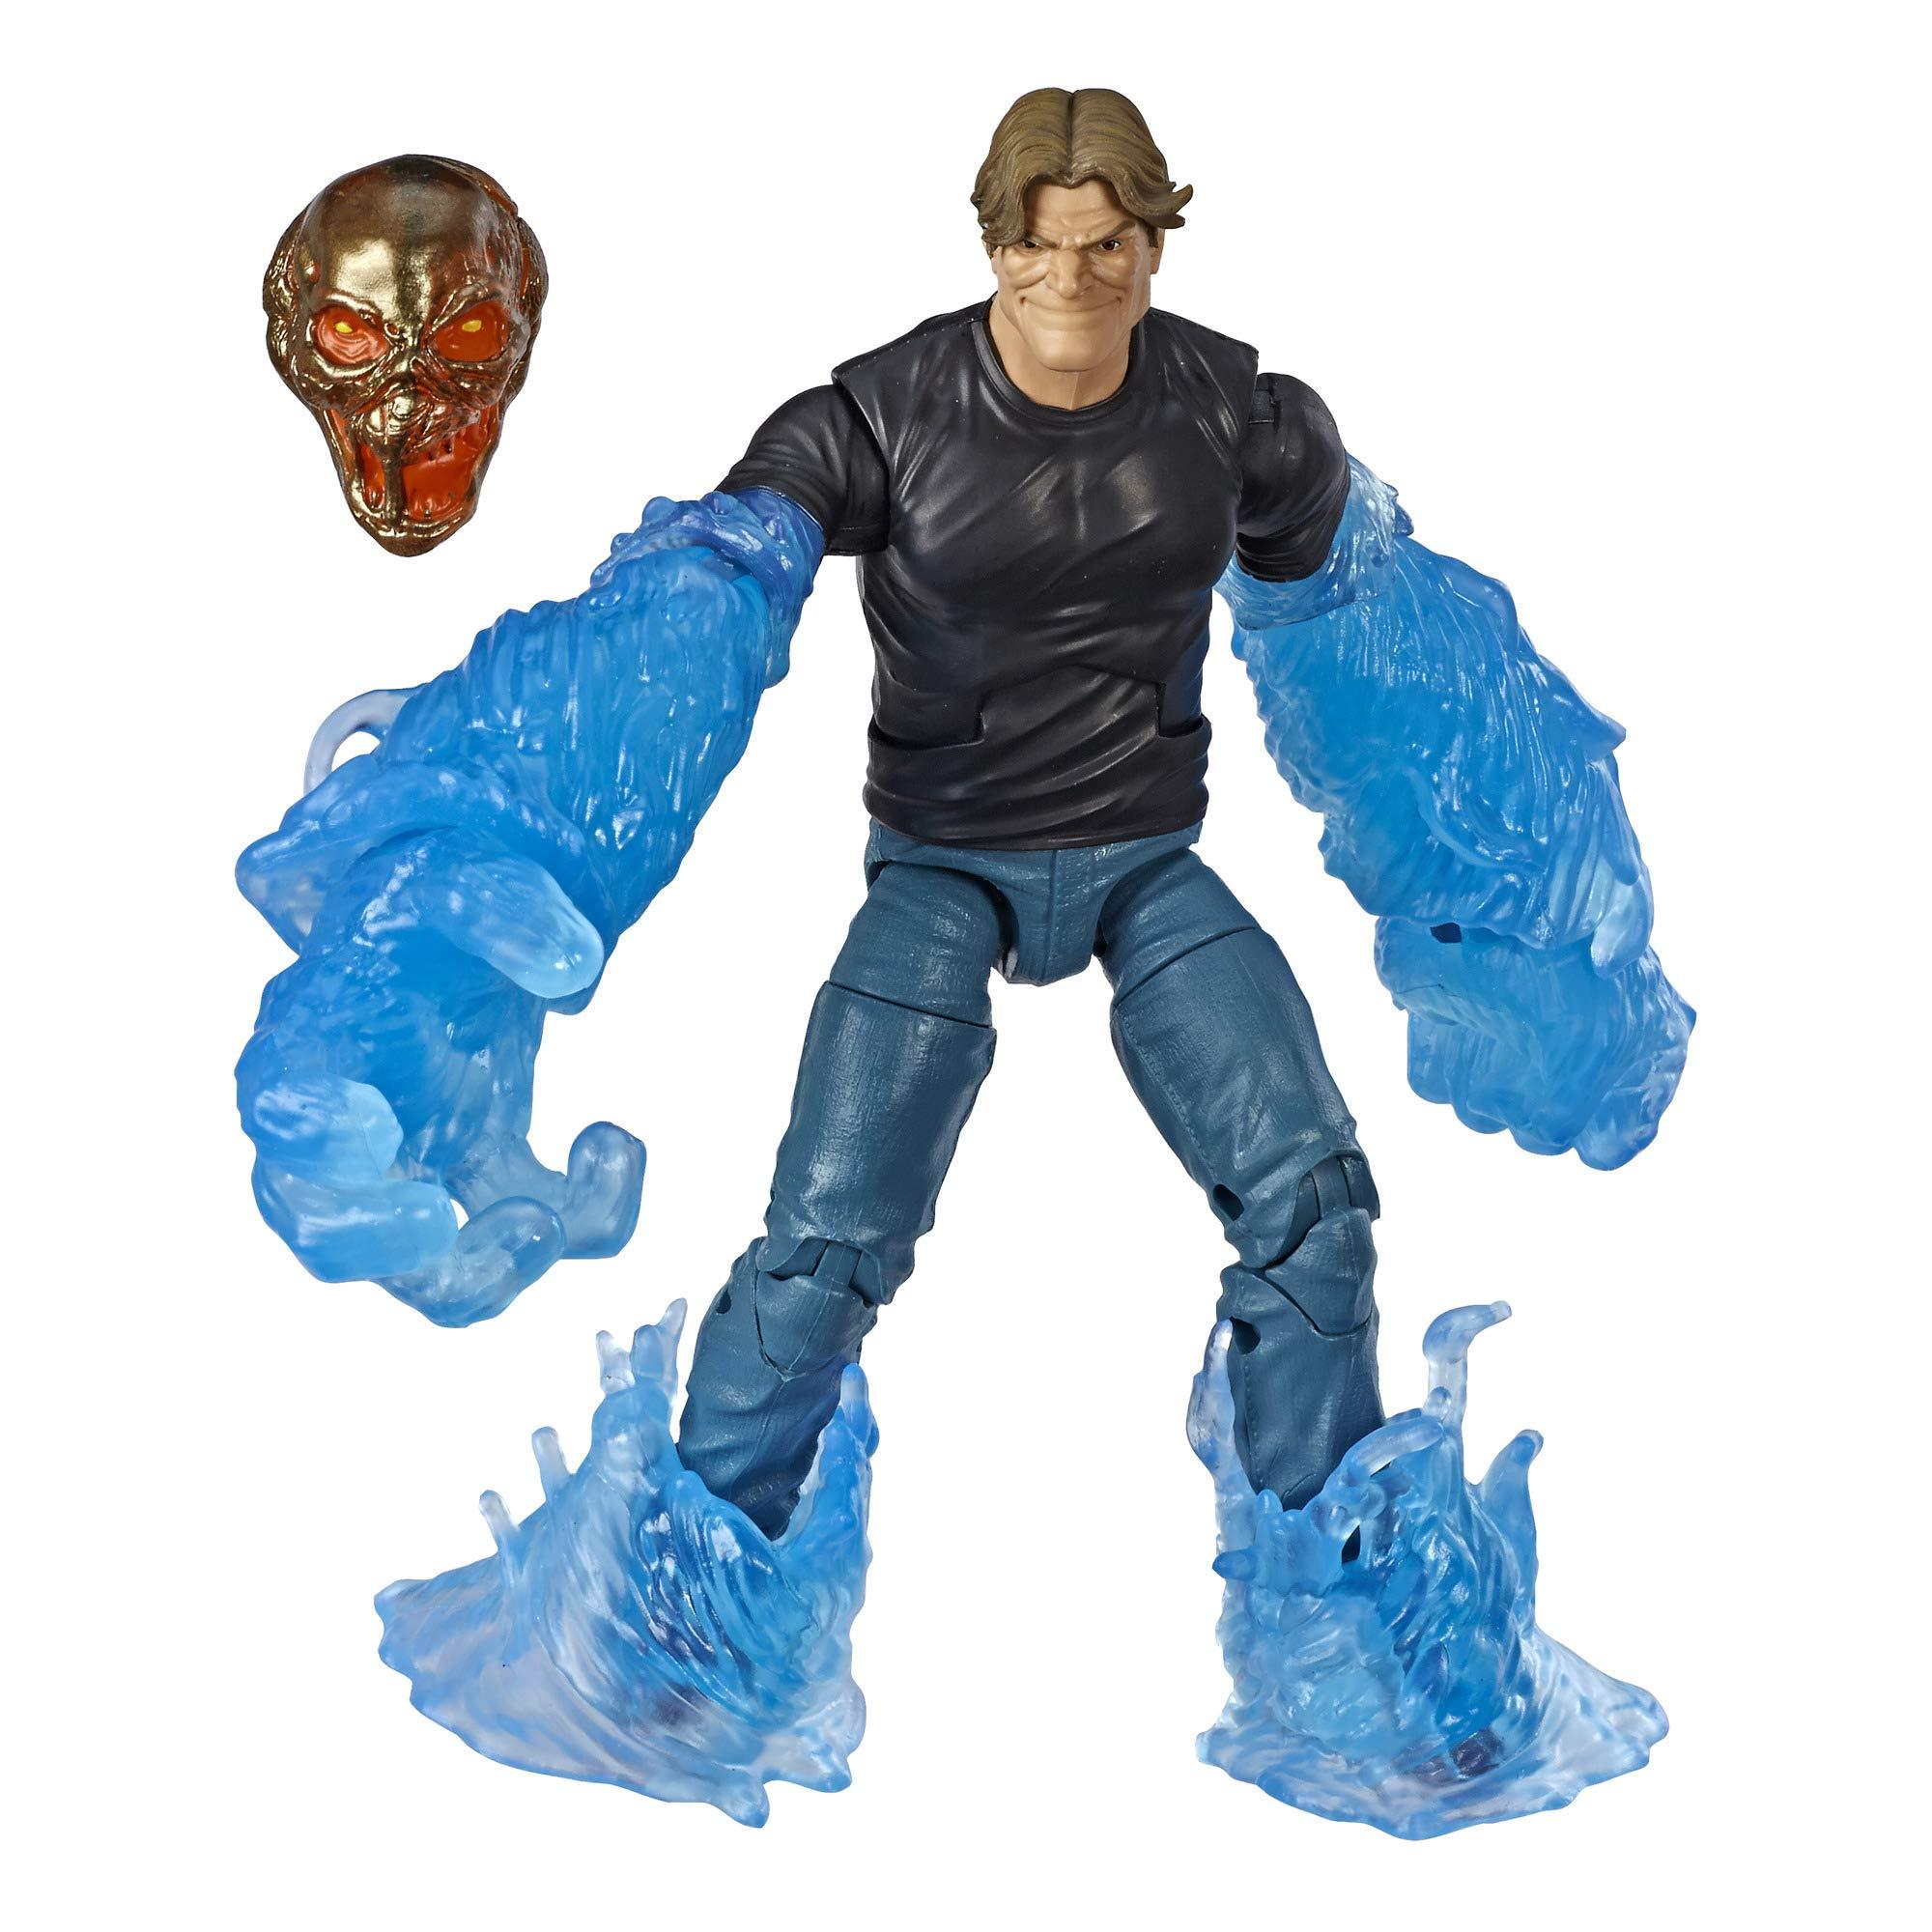 Spider-Man Marvel Legends Series 6'' Hydro-Man Collectible Figure